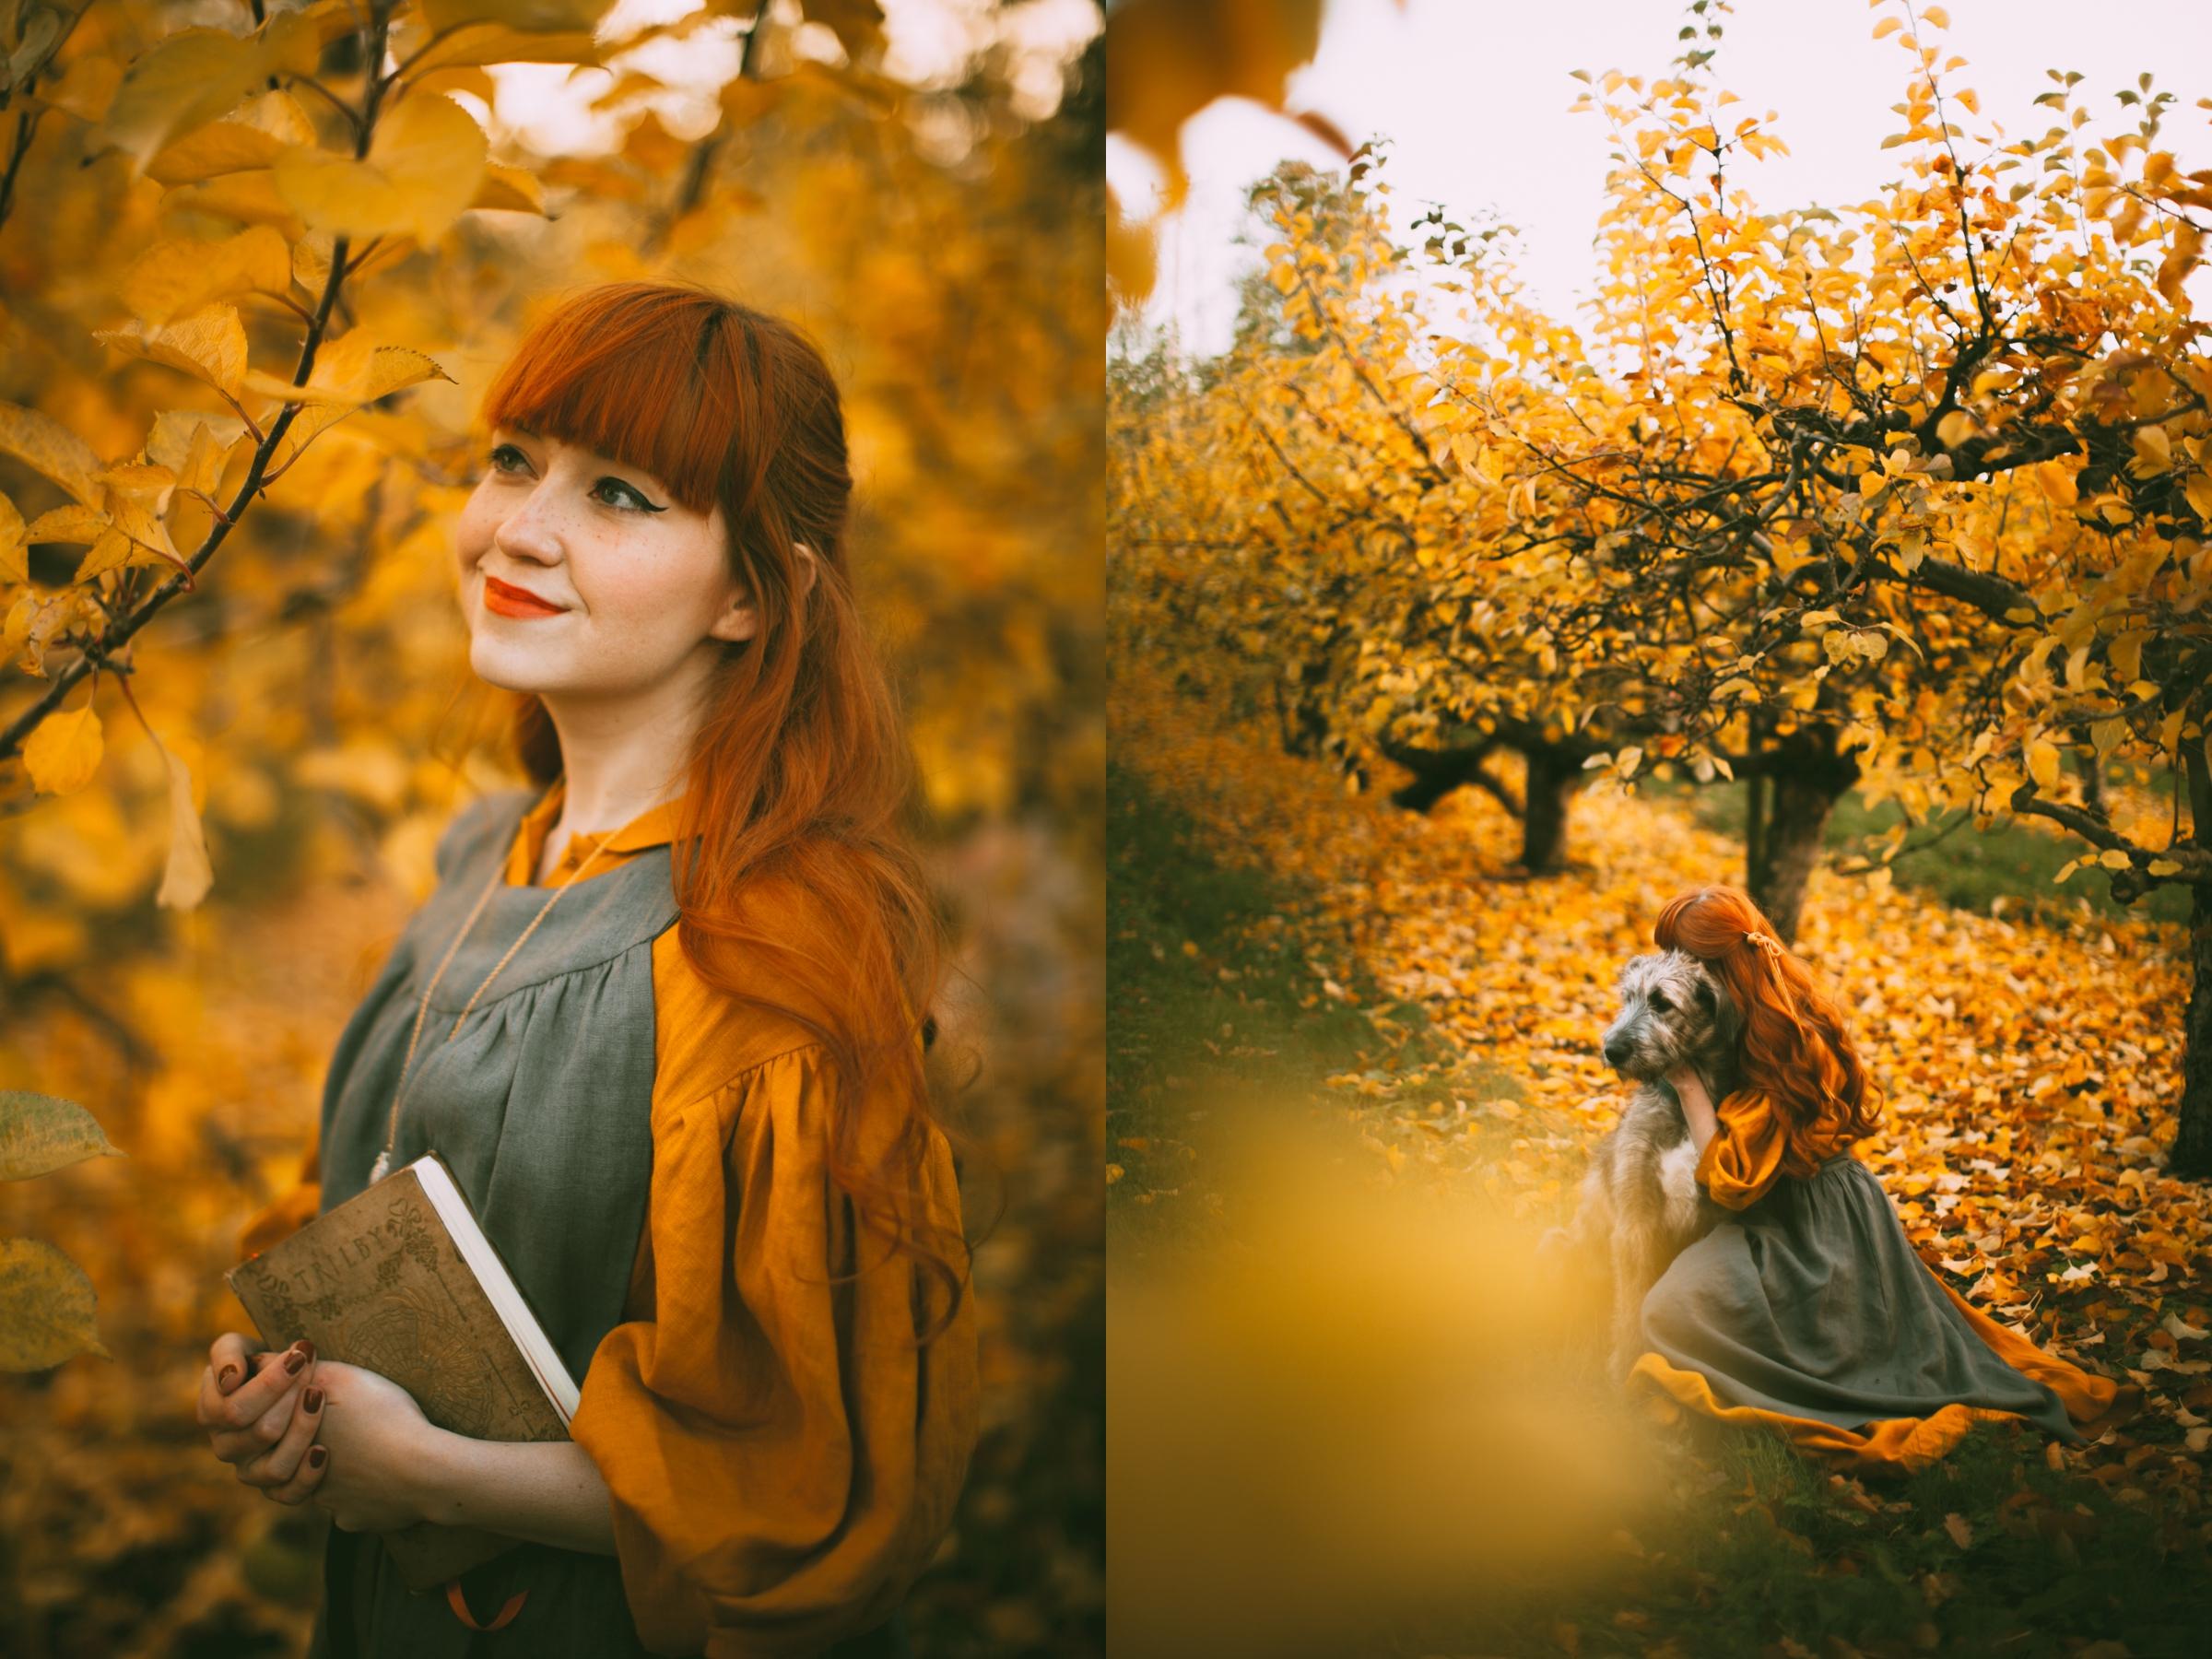 yelloworchard-28-side